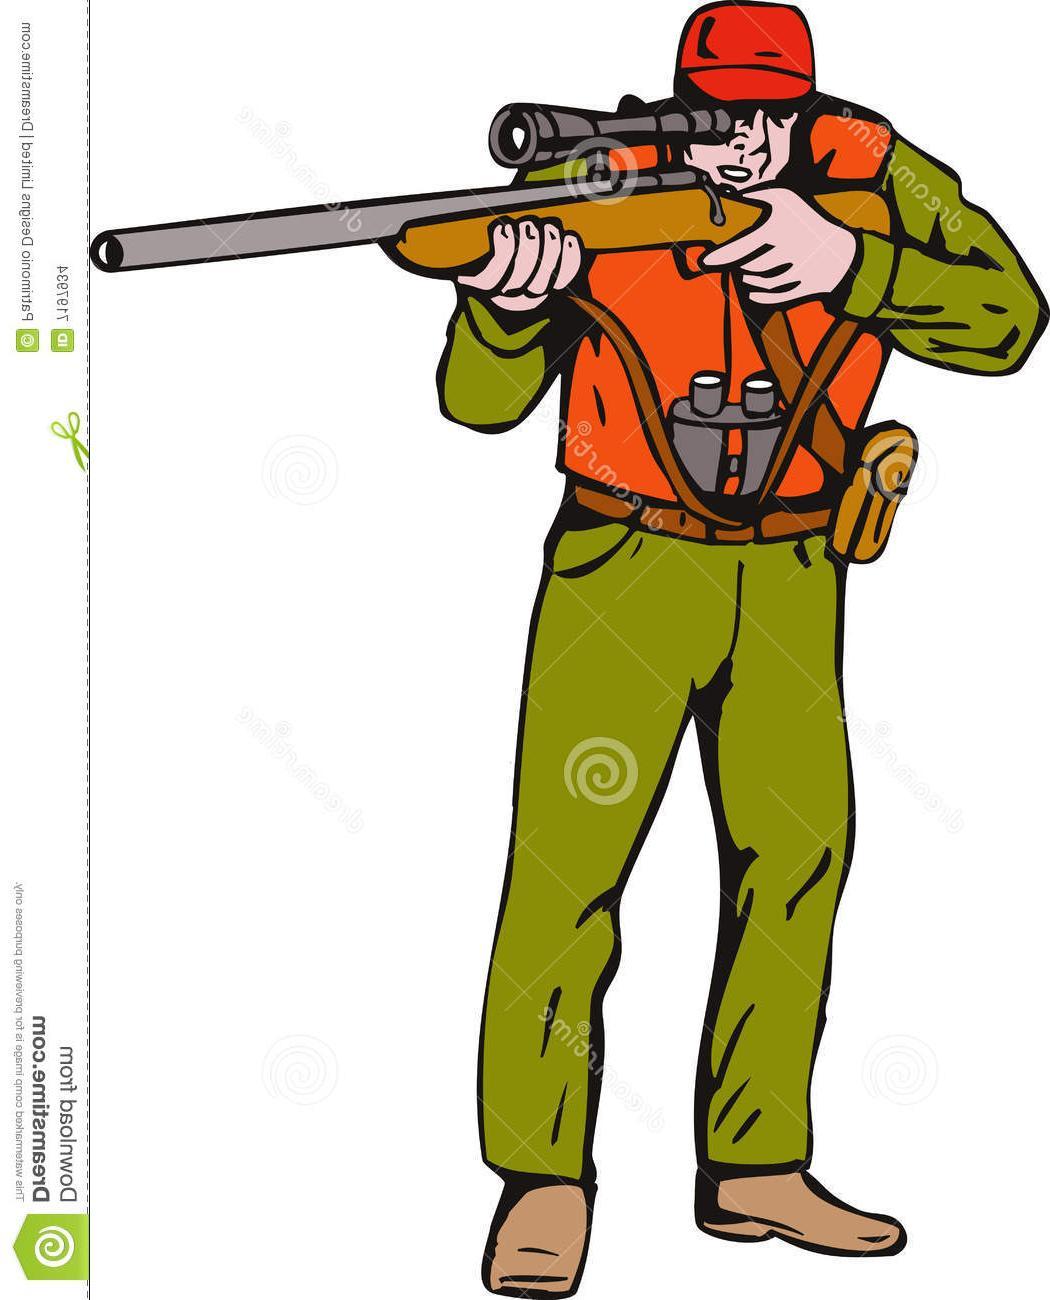 1050x1300 Hd Hunter Clipart Hunting Rifle Aiming Gun File Free